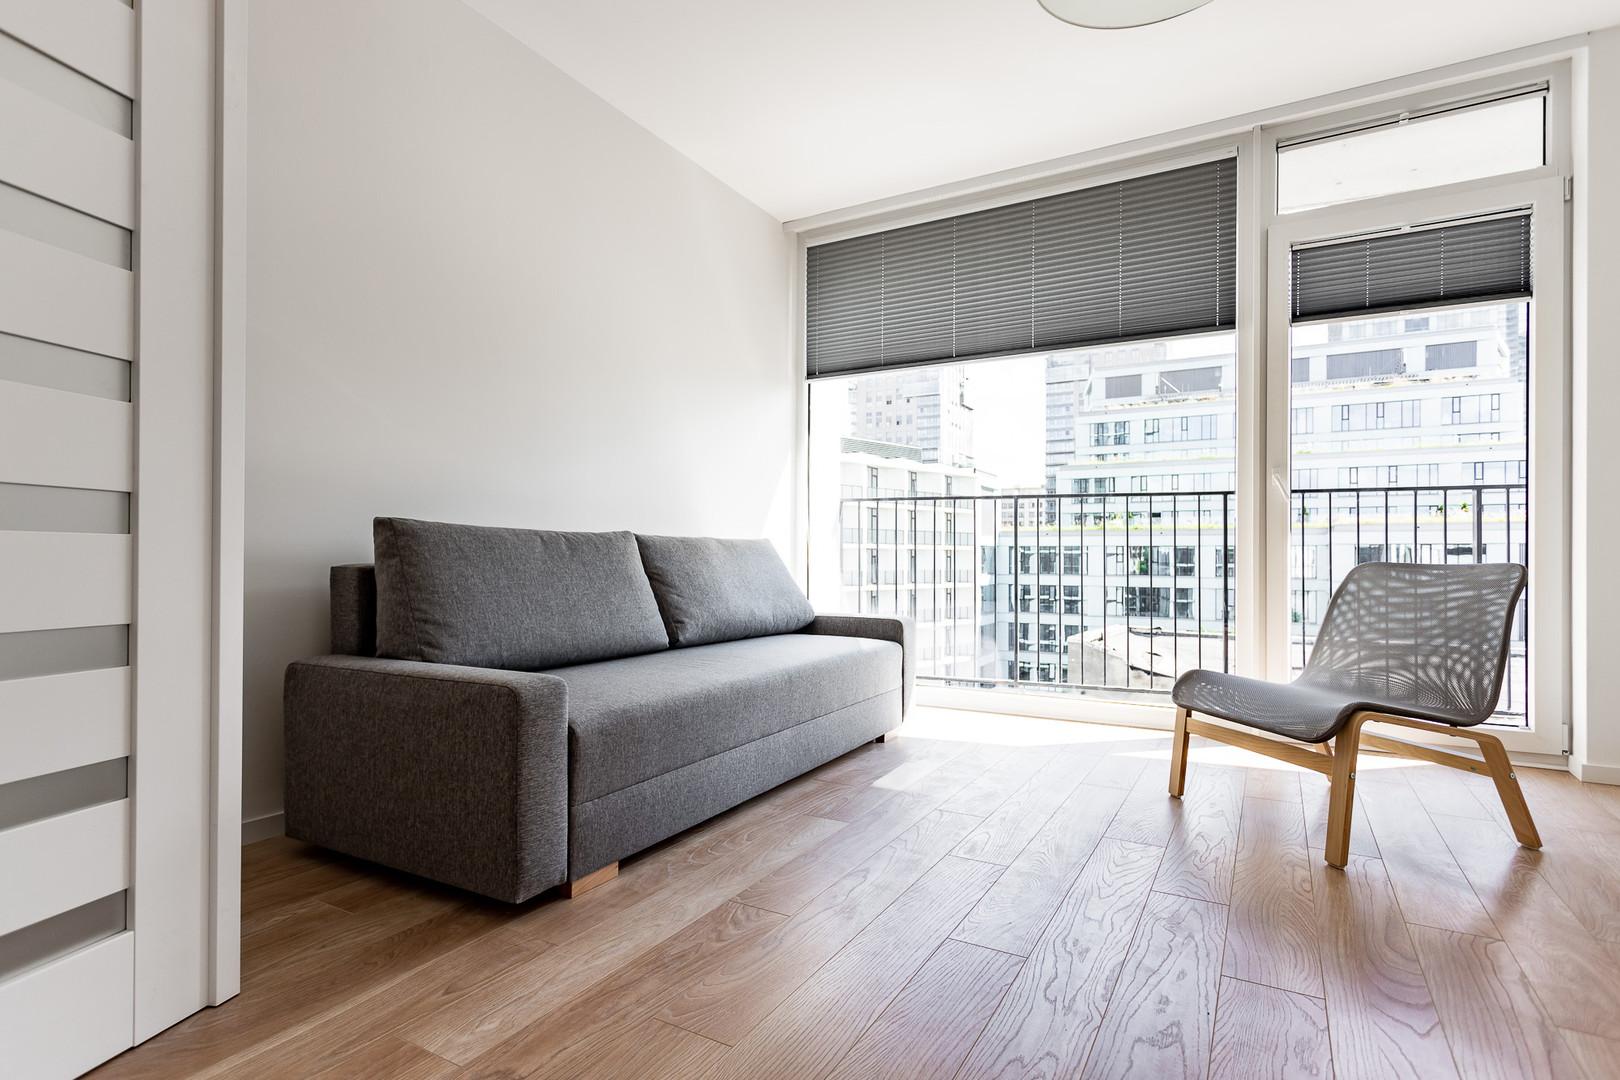 Property for rent Warasaw Grzybowska6.jp